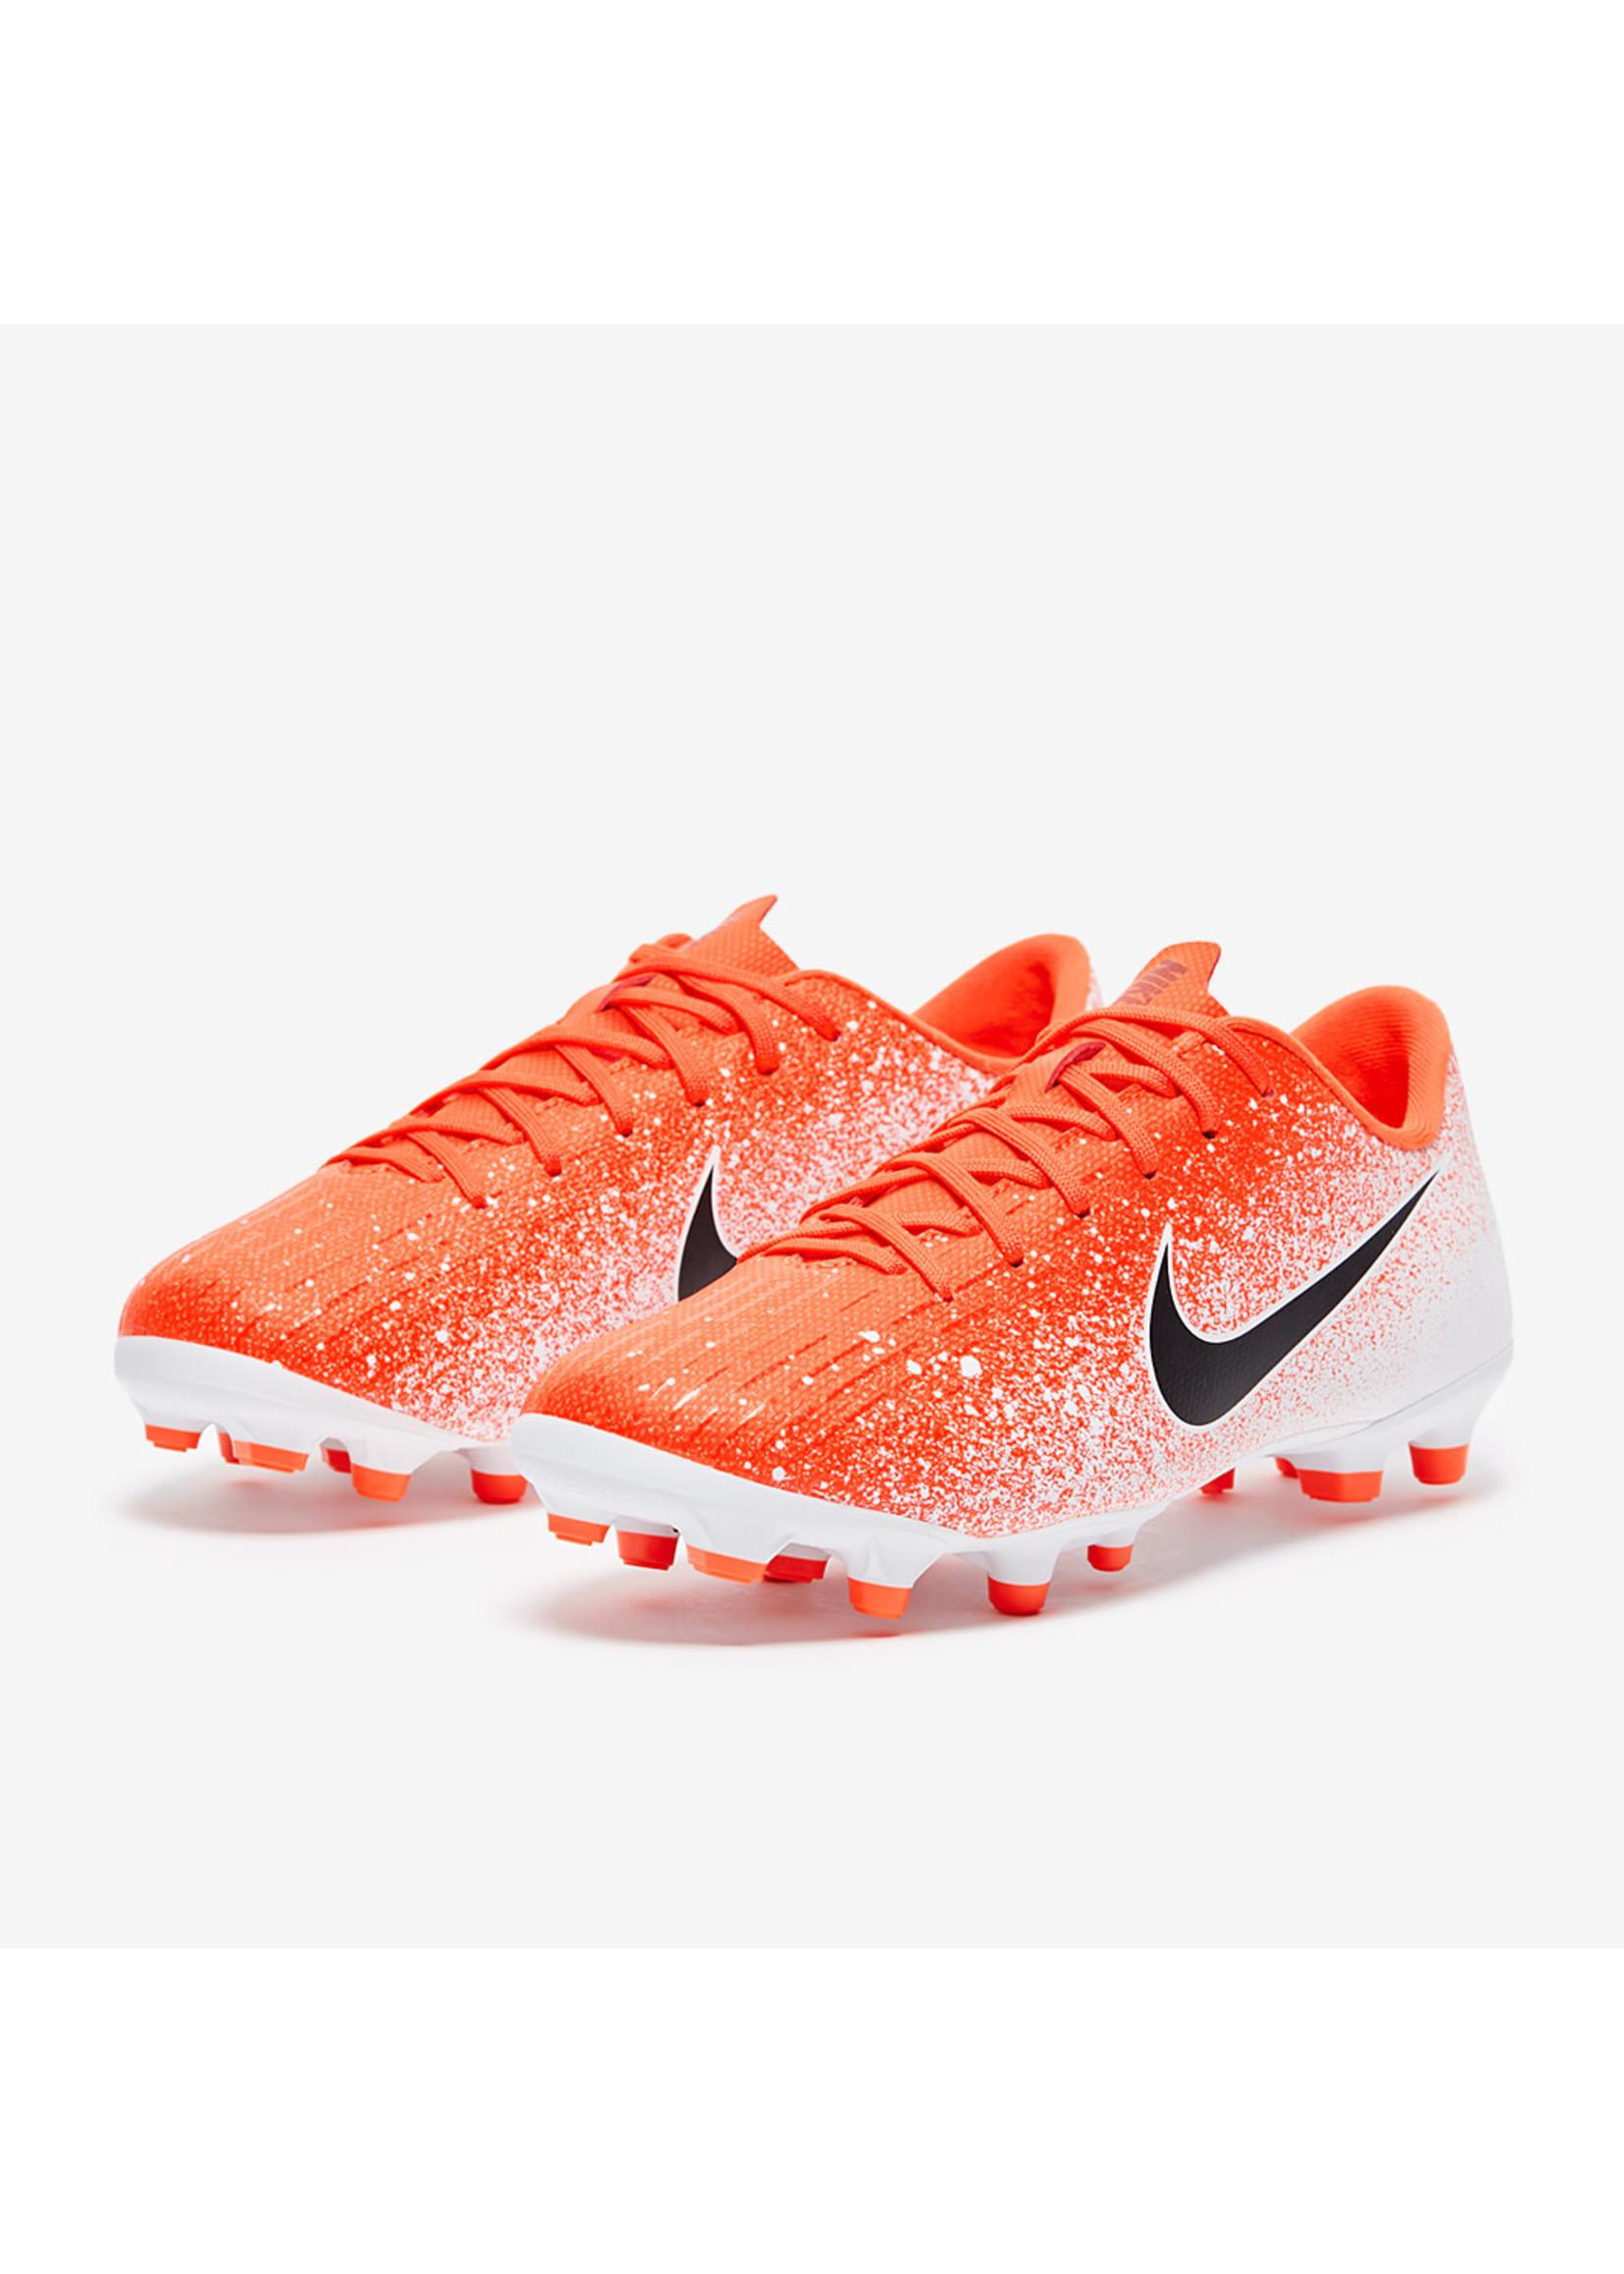 Nike Jr Vapor 12 Academy PS FG/MG - Orange/White